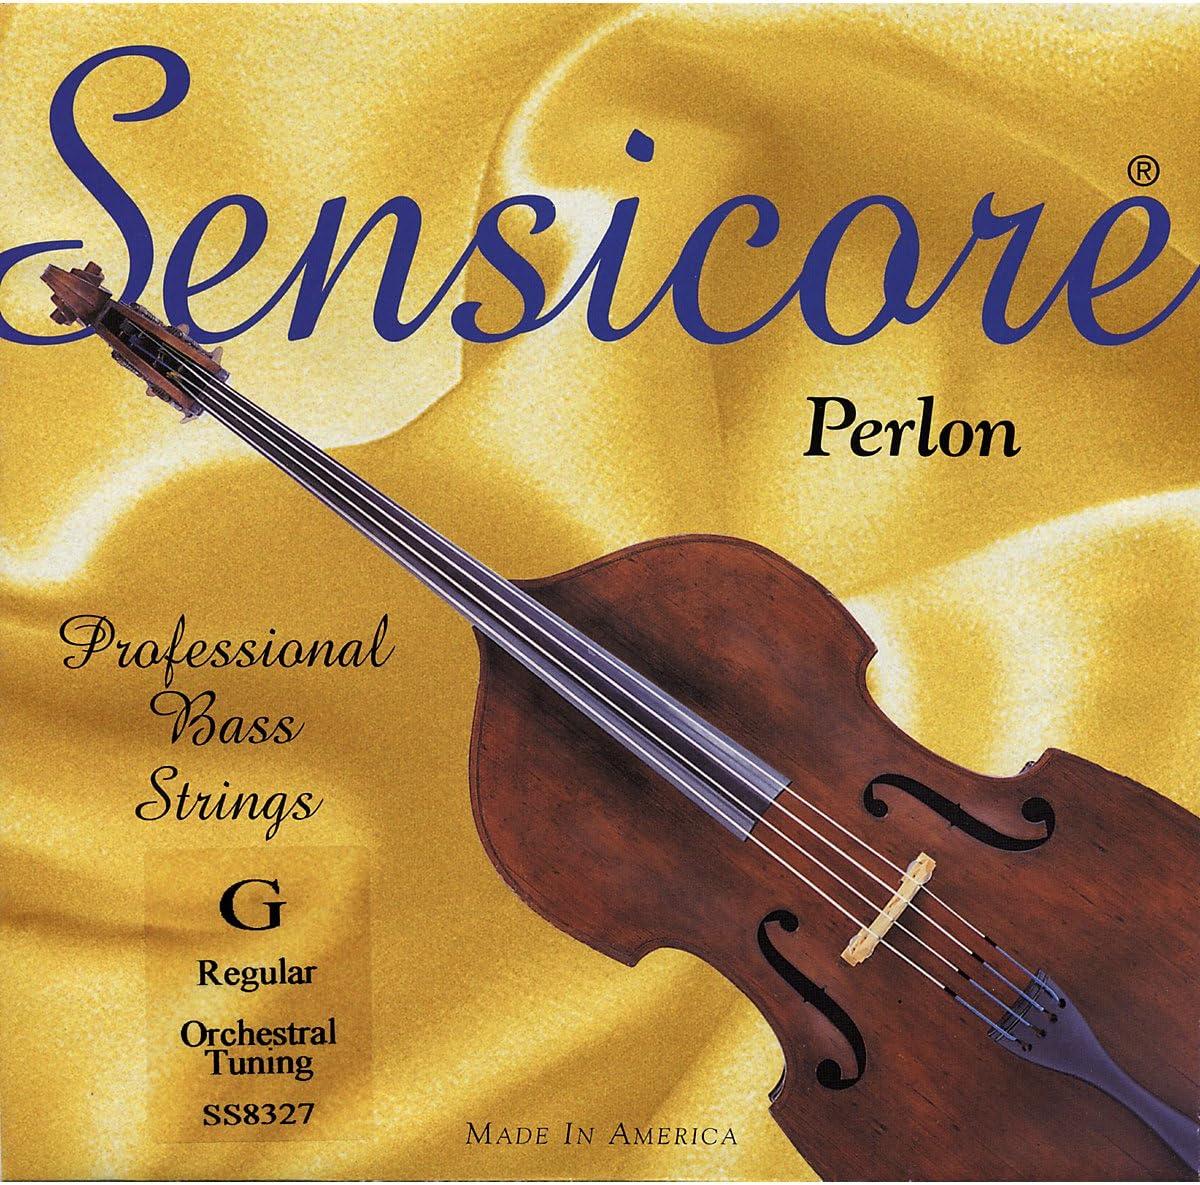 Super Sensitive String Bass Care 8327